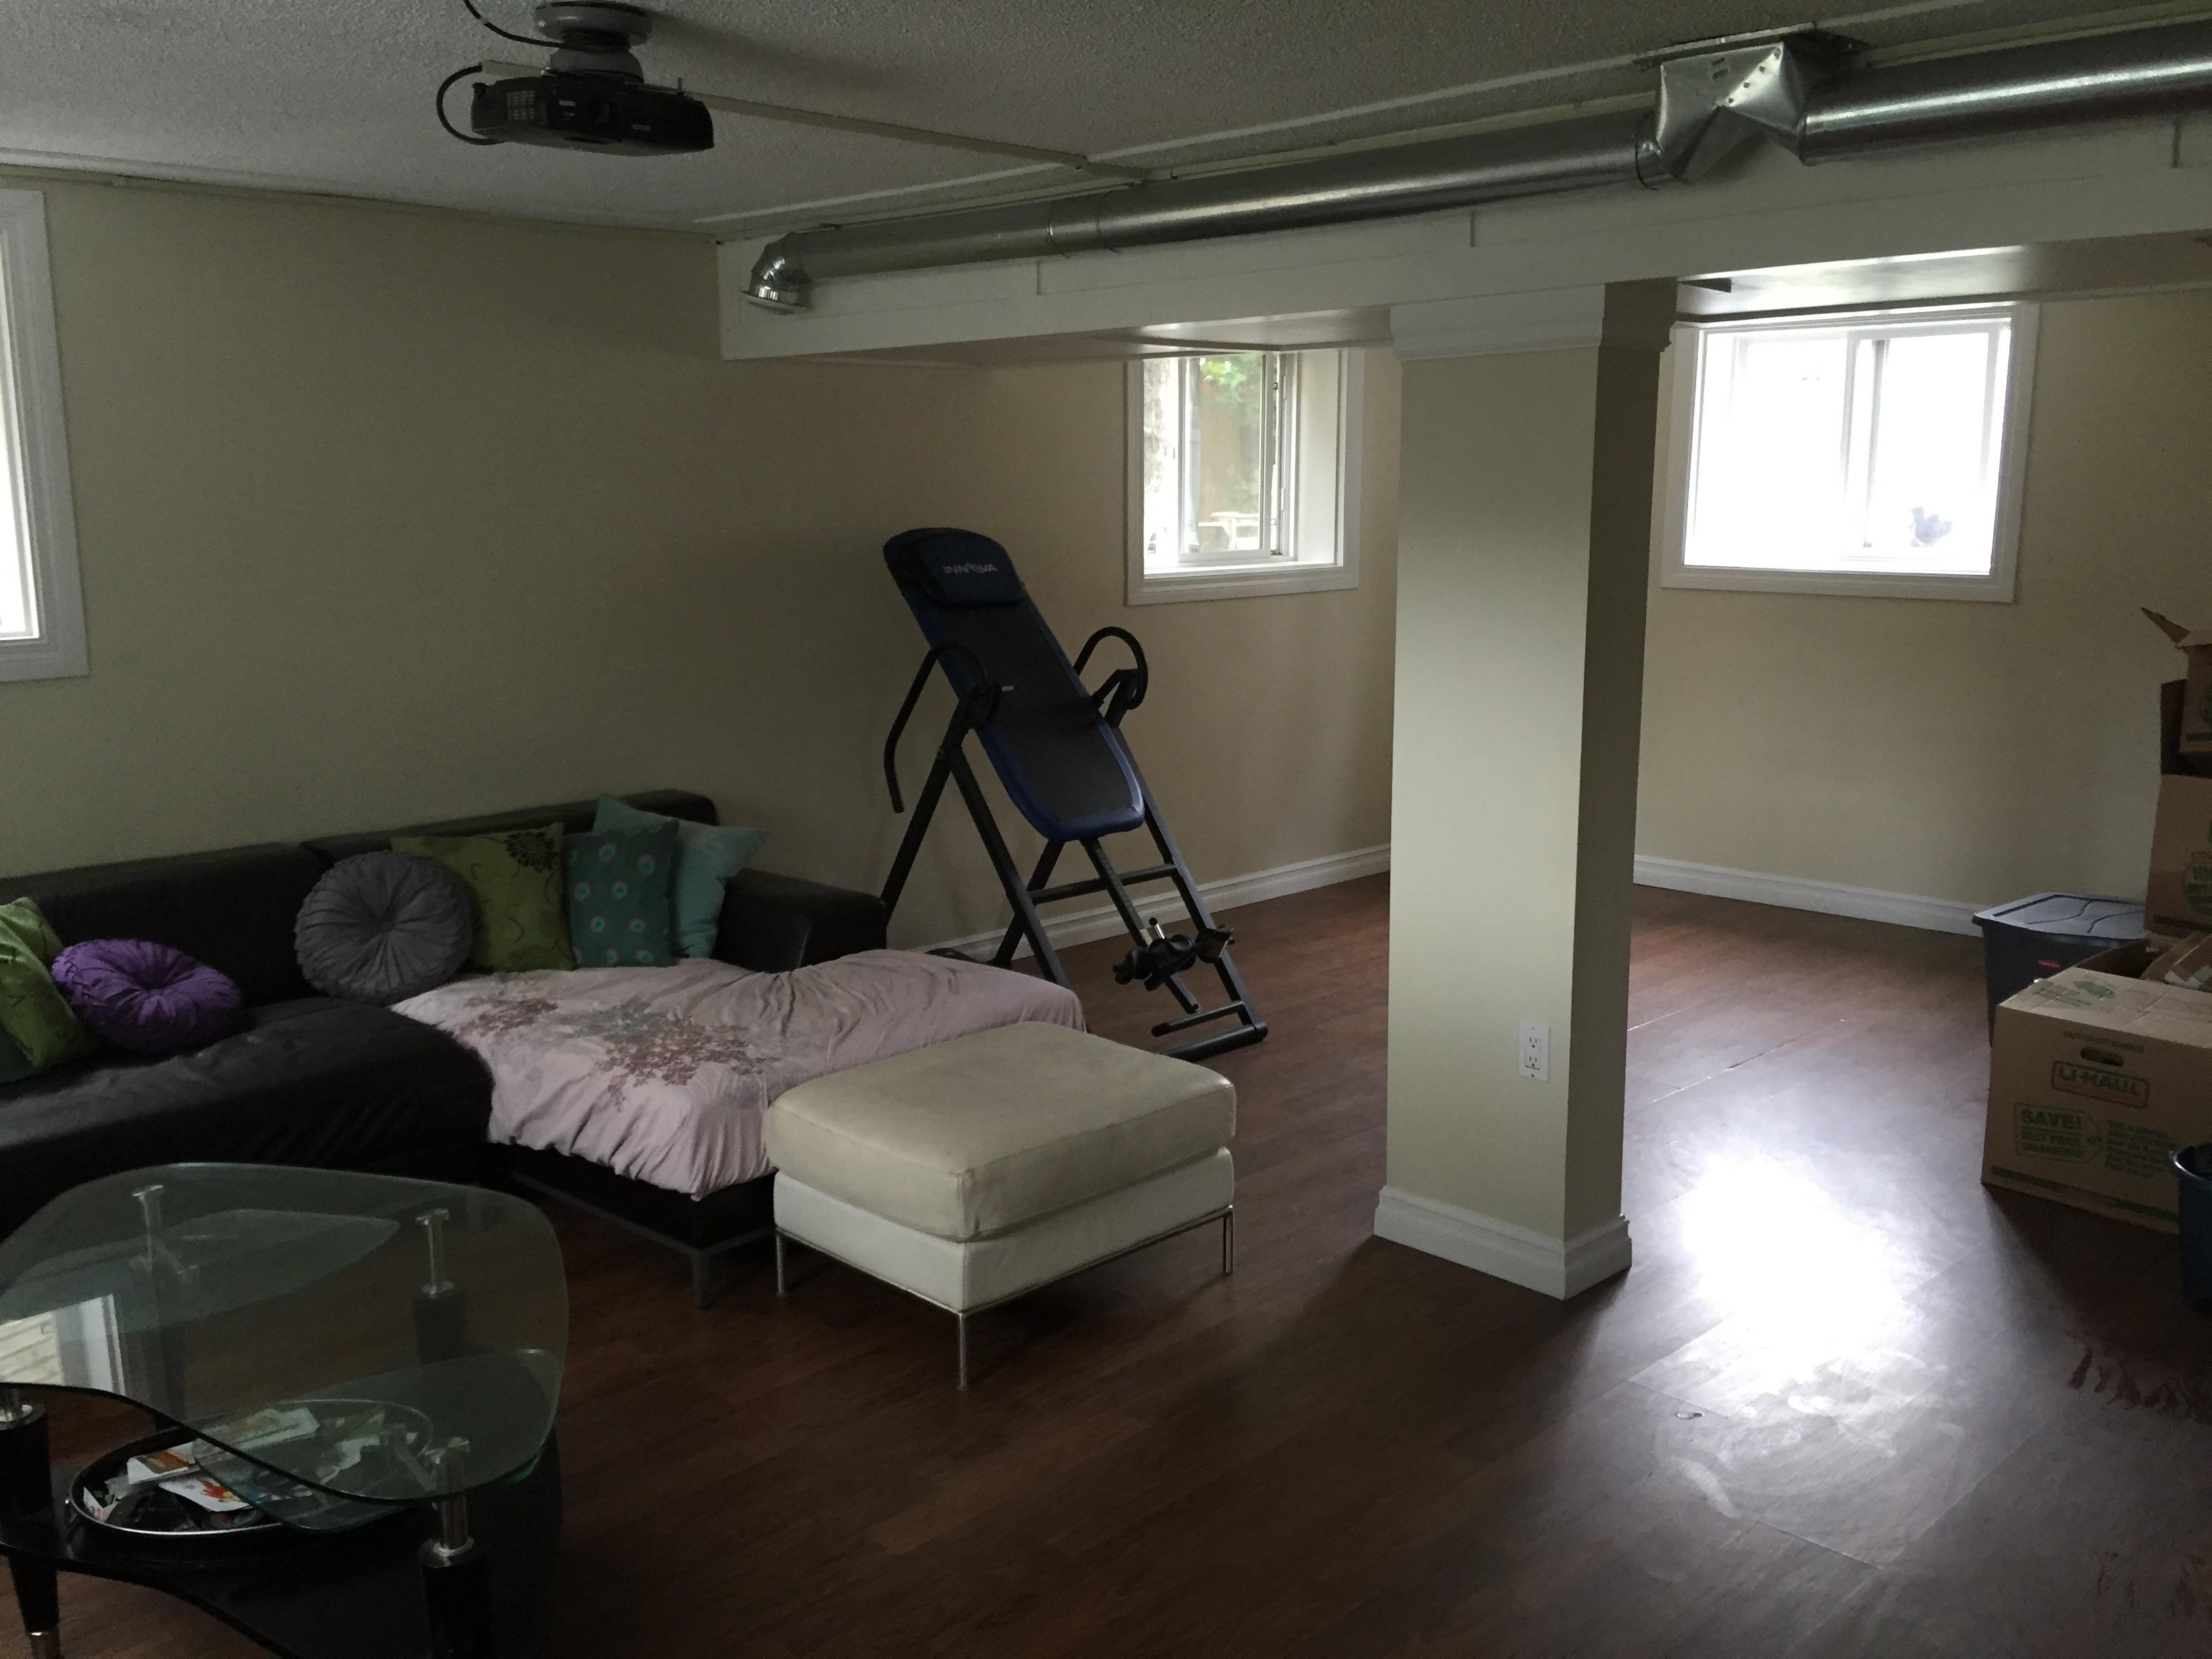 3 Bedroom Full House Finished Basement Delton 1899 Month 3 Star Group